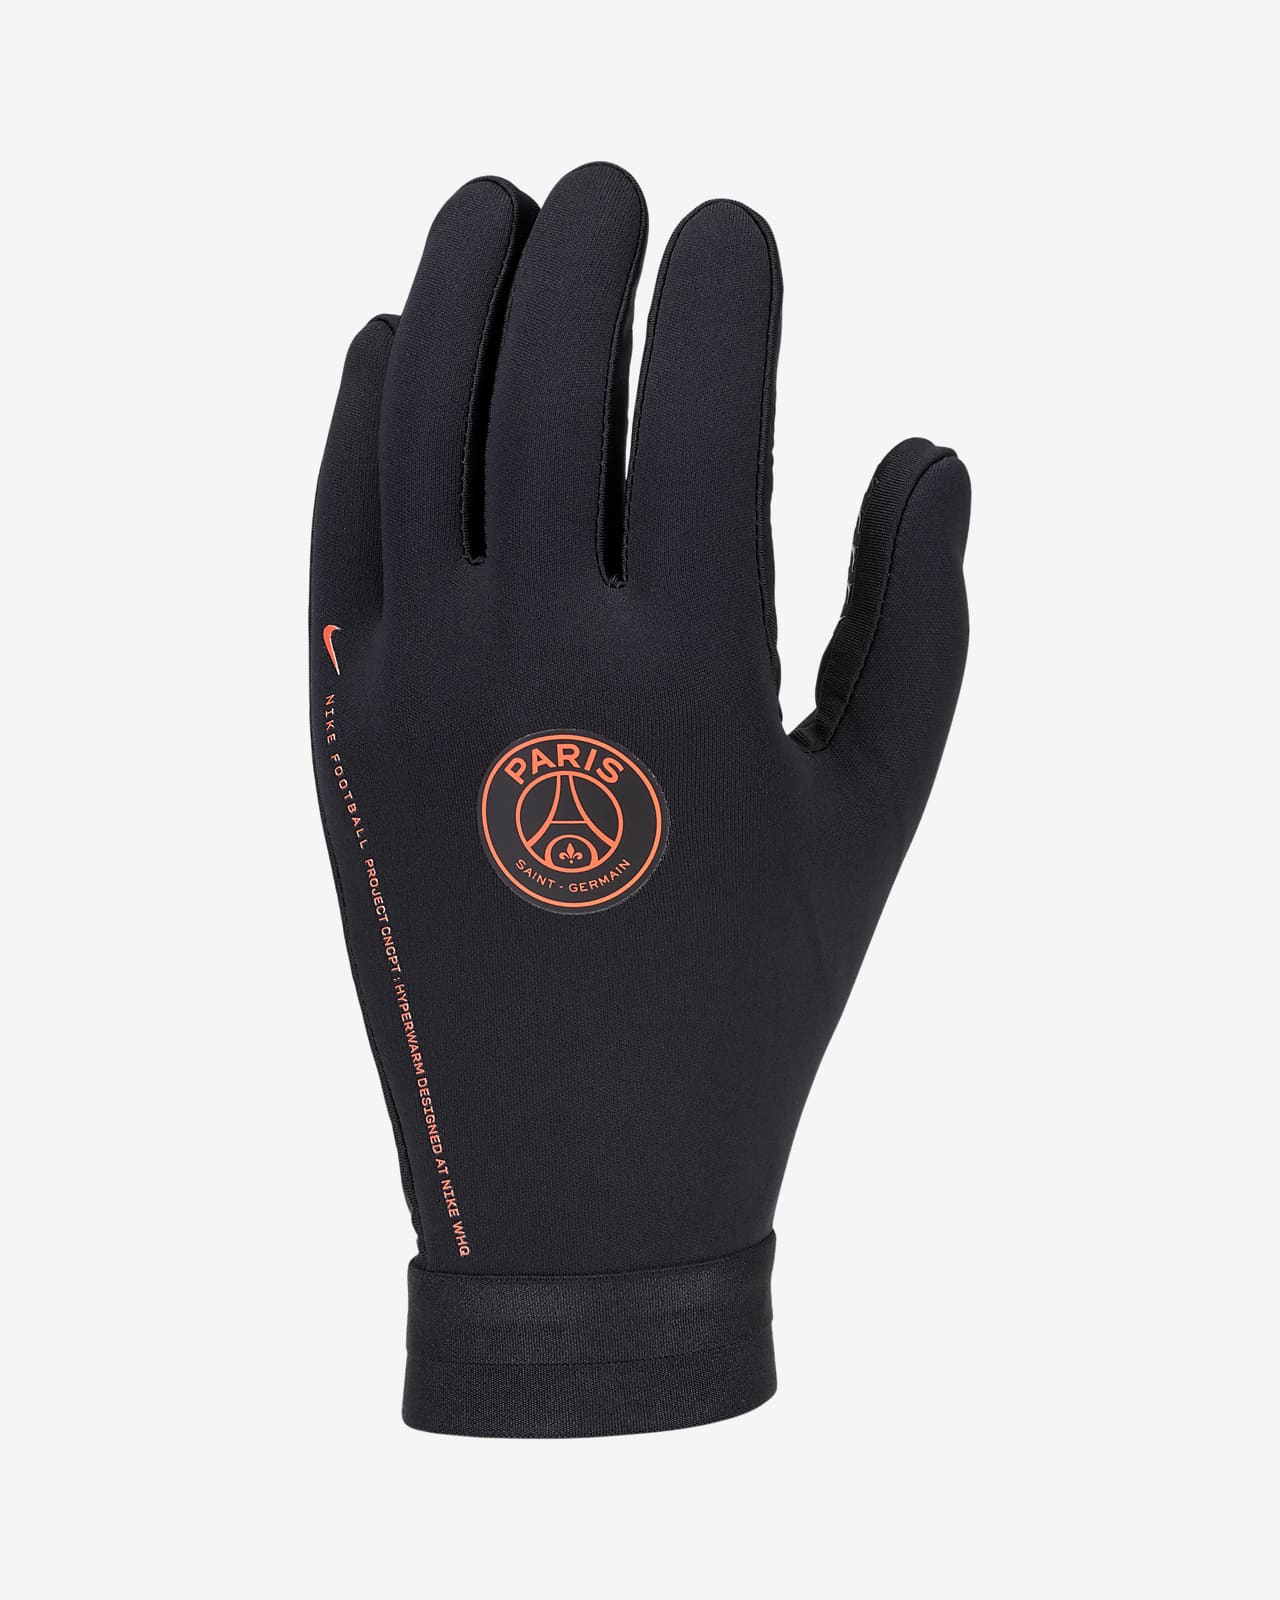 Rękawice piłkarskie Paris Saint-Germain HyperWarm Academy